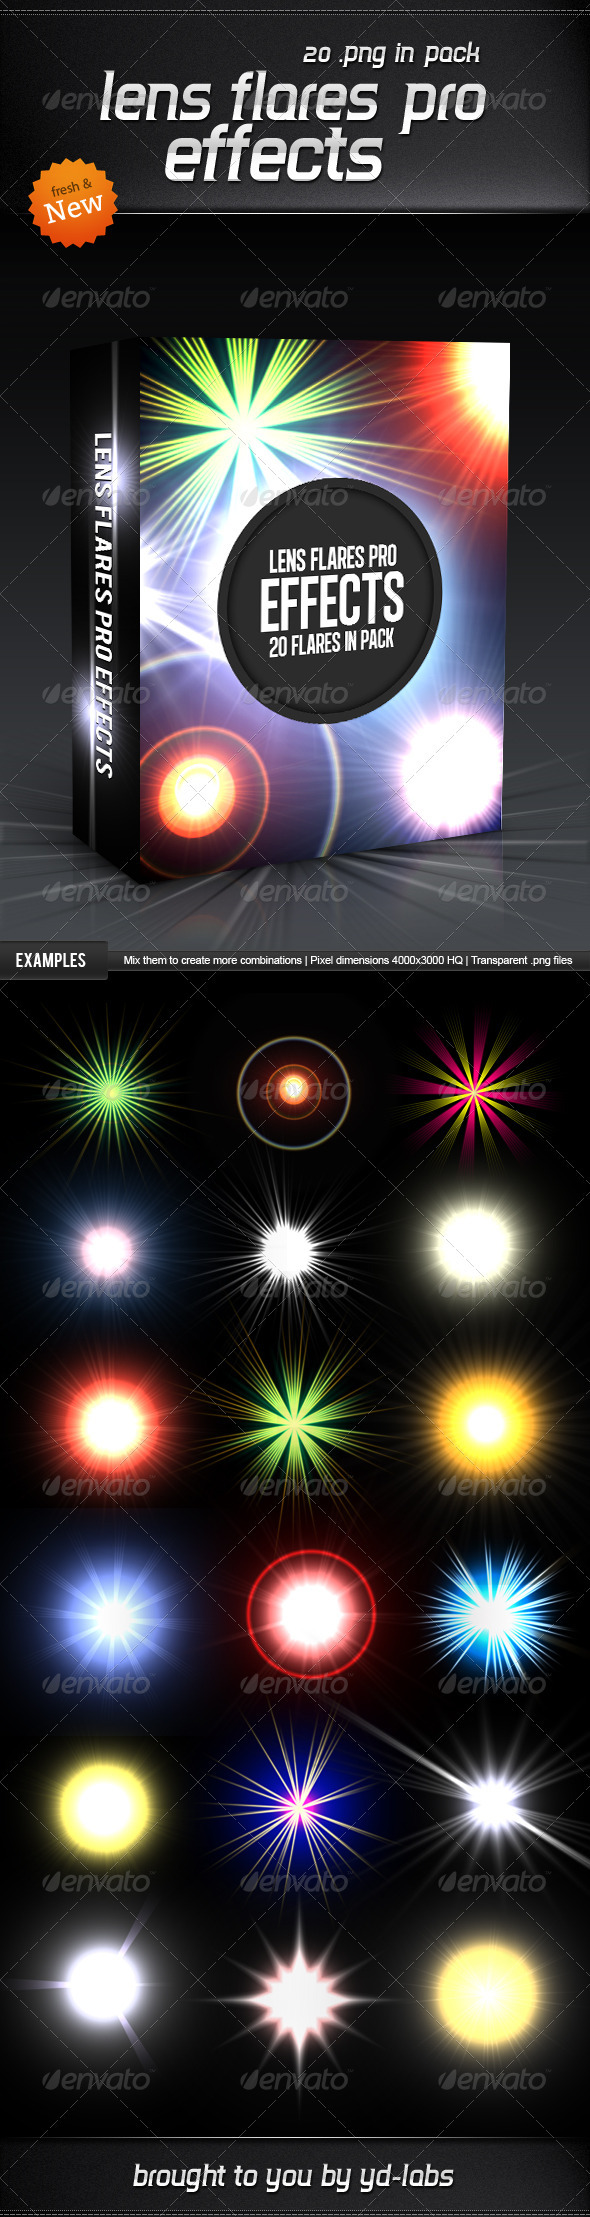 Lens Flares Pro Effects - Decorative Graphics